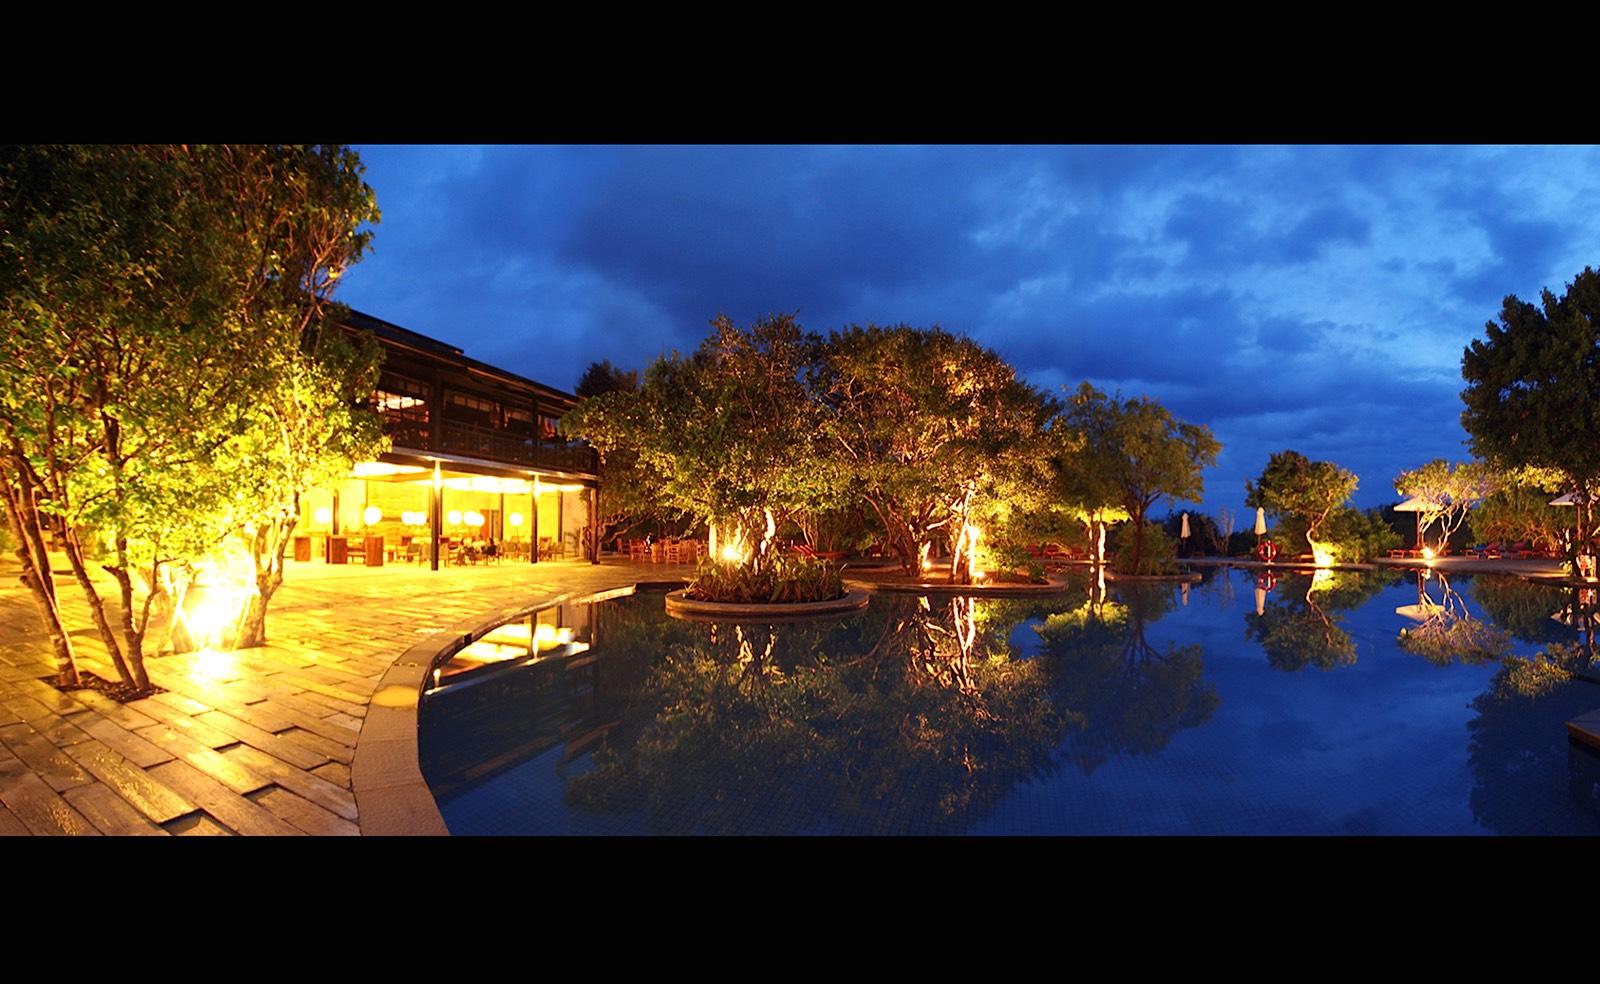 invite-to-paradise-holiday-honeymoon-sri-lanka-specialists-safari-lodge-cinnamon-wild-hotel-2.jpg